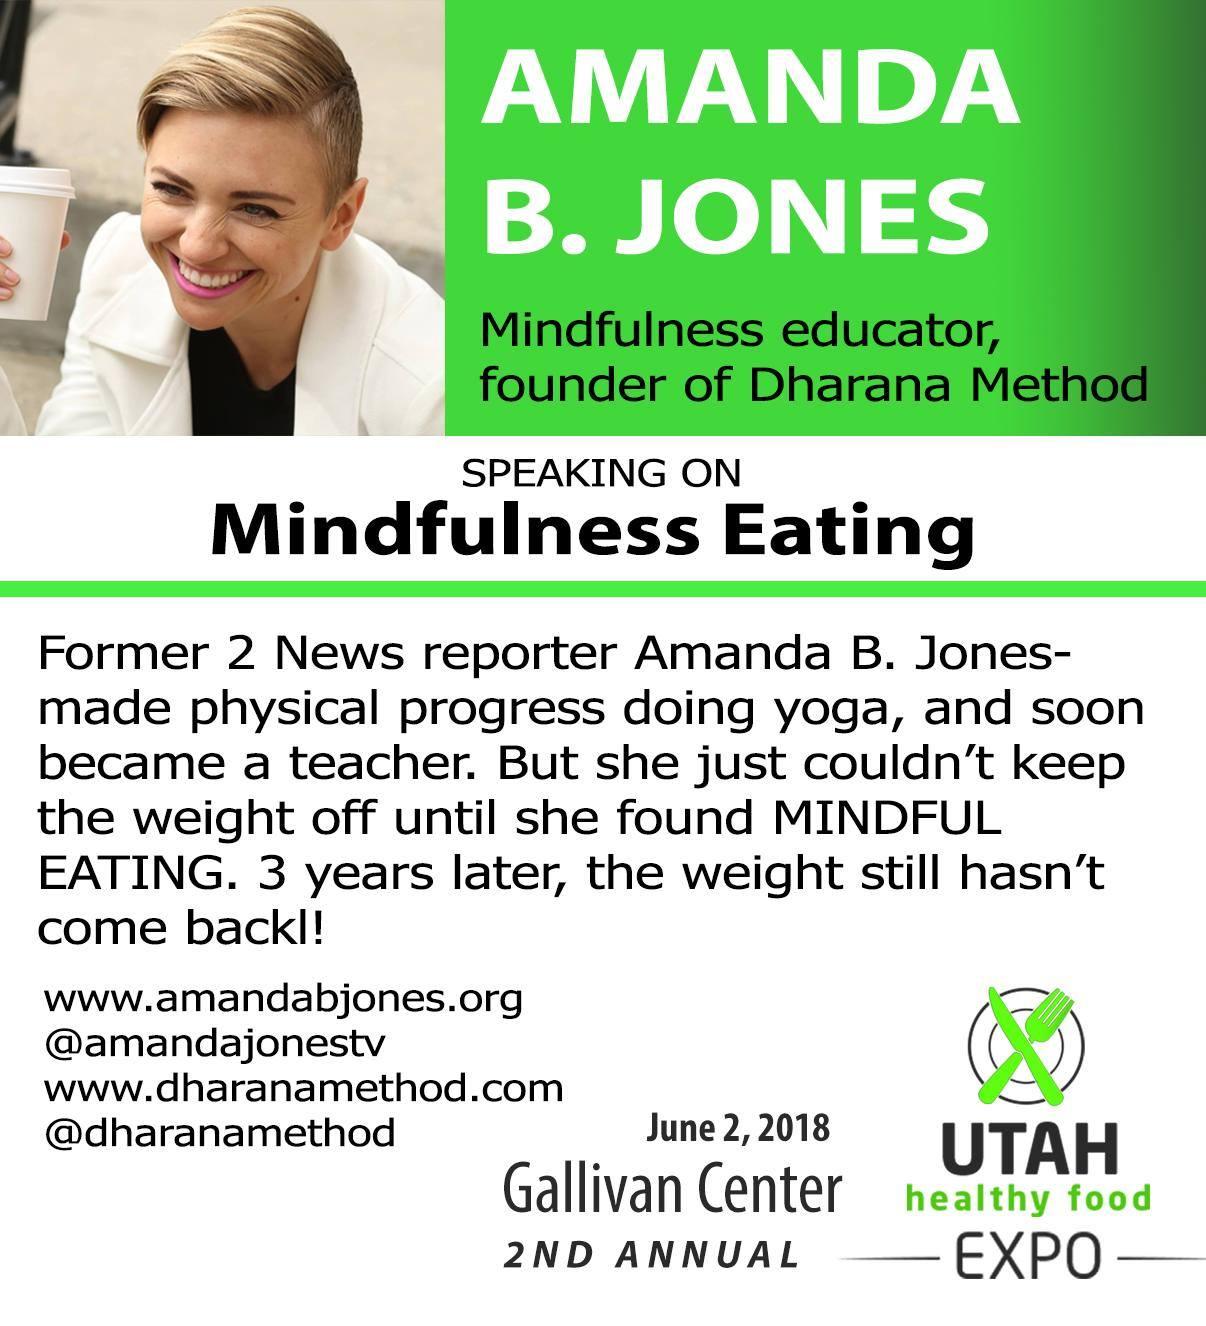 amanda jones mindfulness healthy eating utah